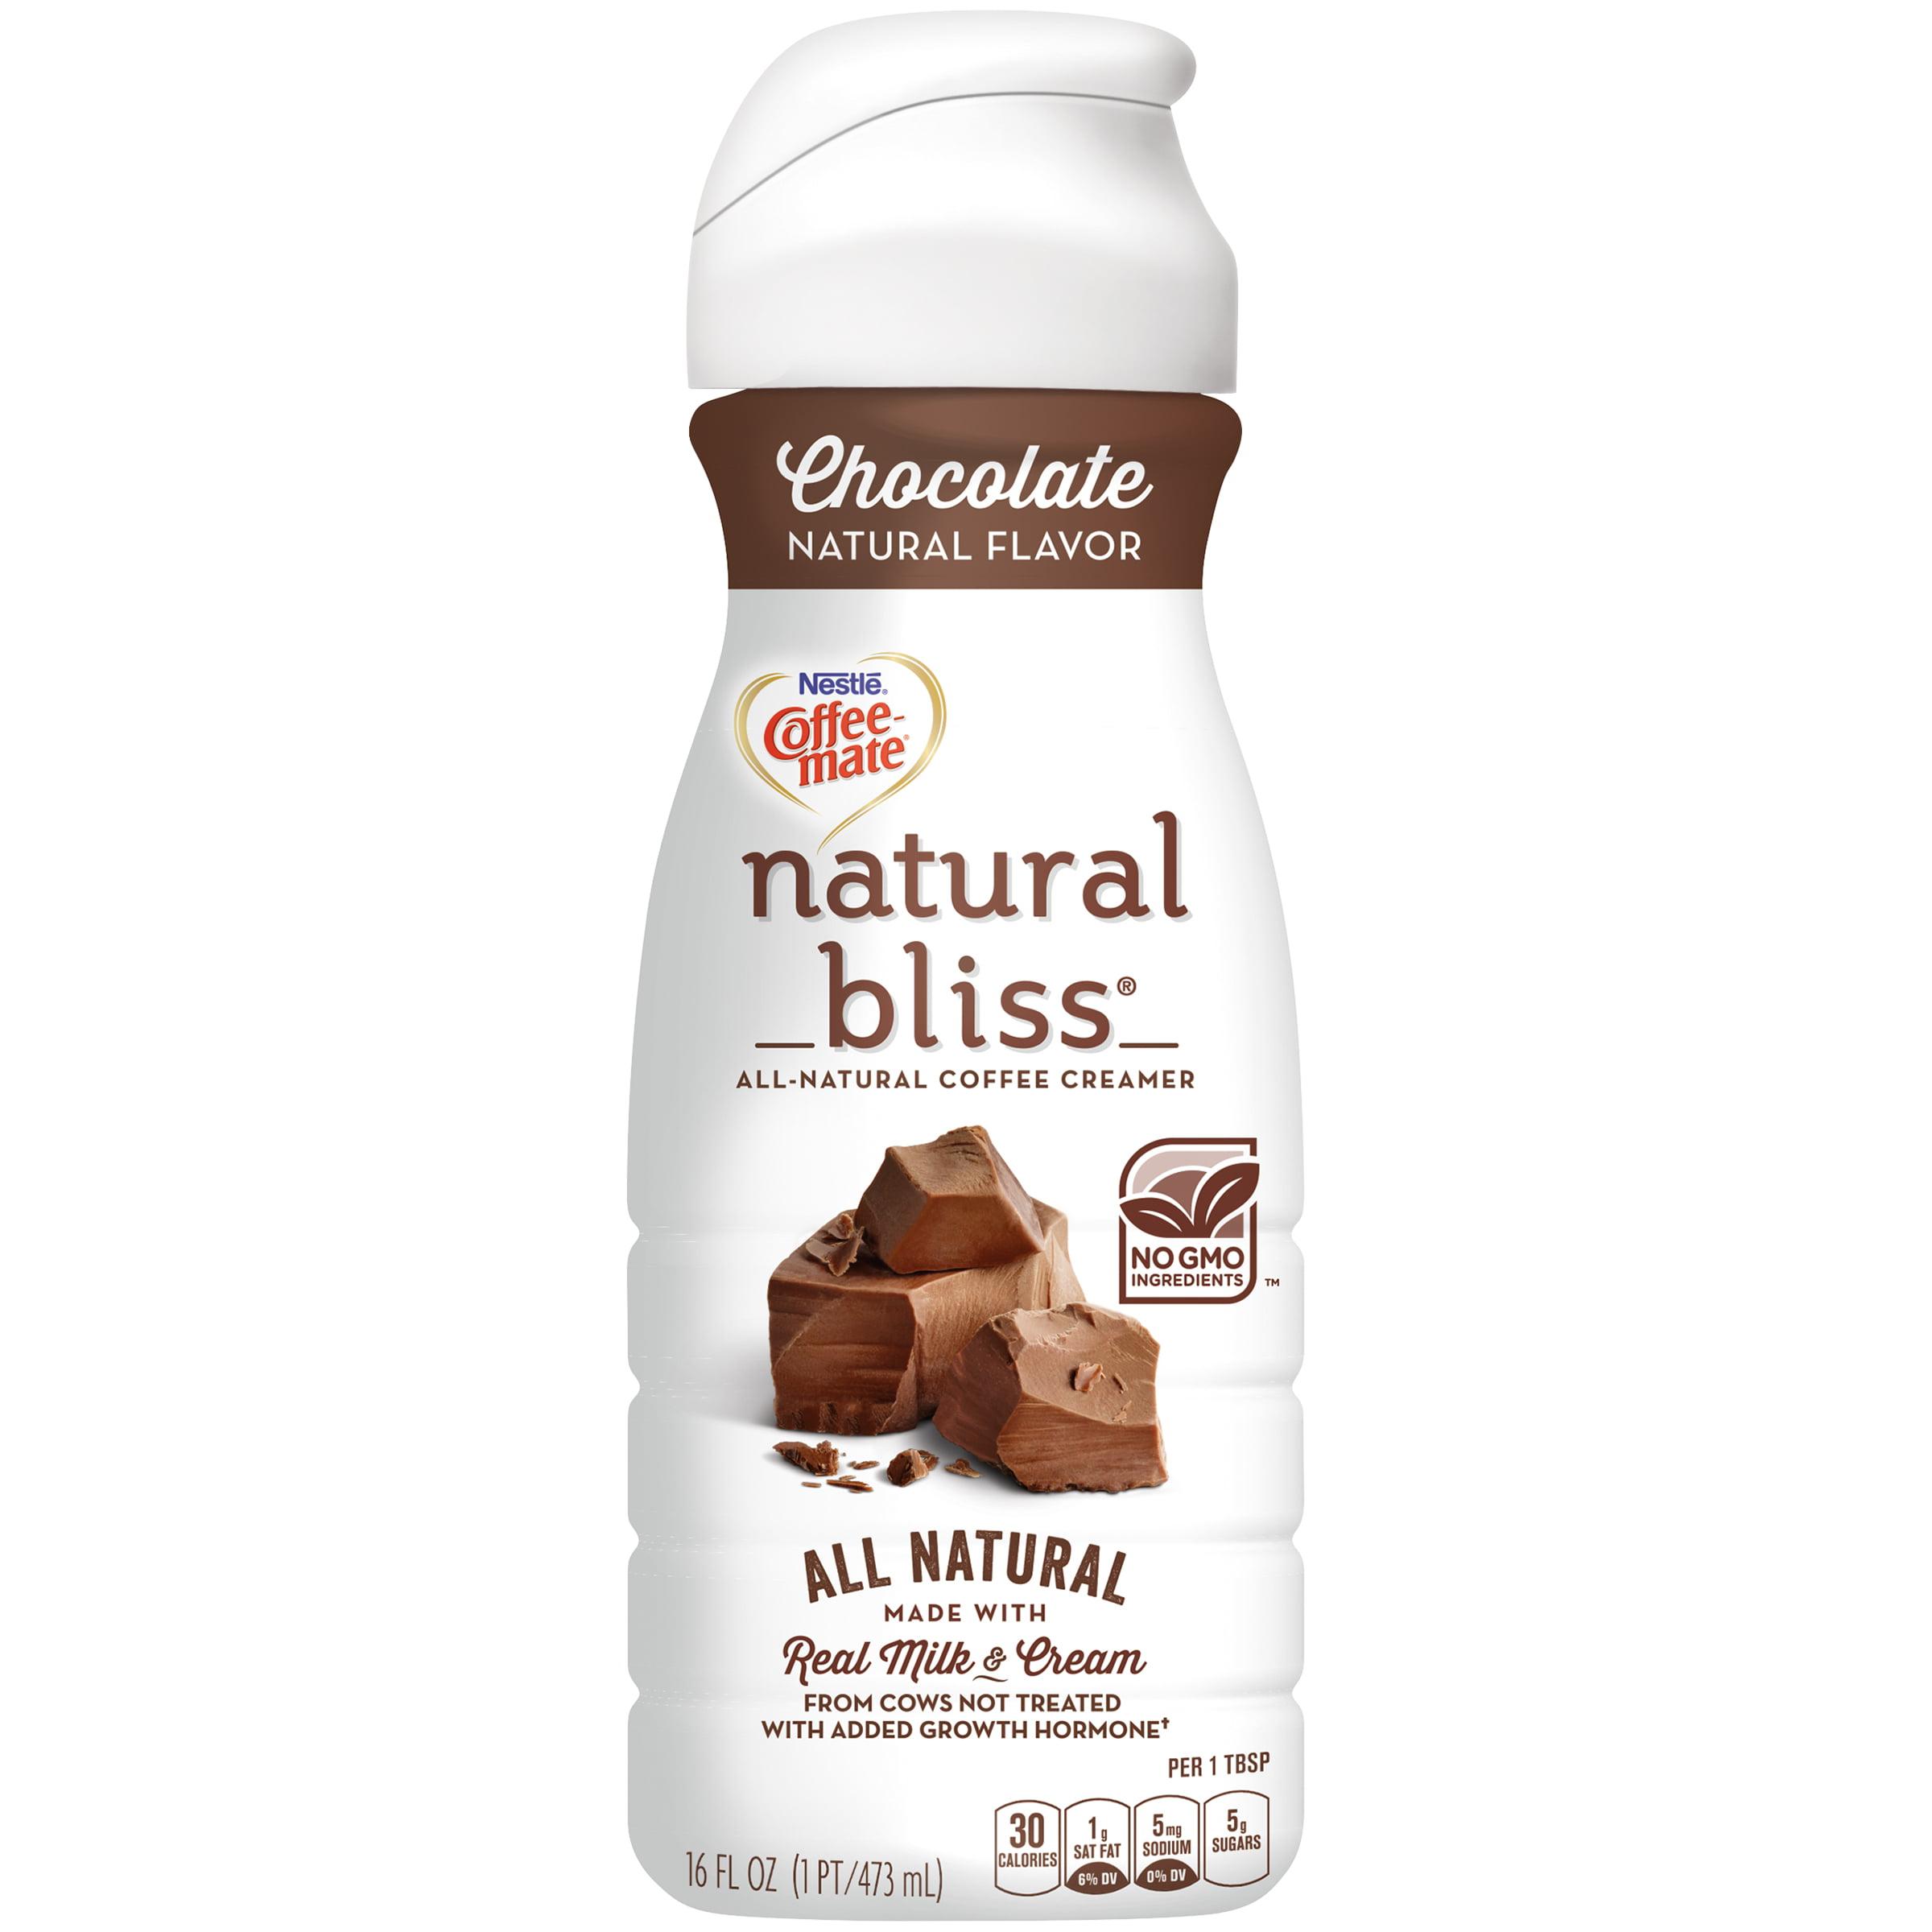 COFFEE-MATE NATURAL BLISS Chocolate Liquid Coffee Creamer 16 fl. oz. Bottle